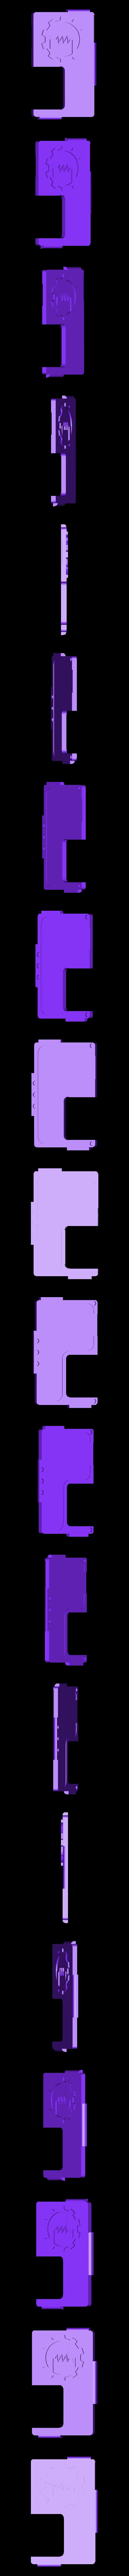 Front_Gear_V3.stl Download free STL file Pulse BF Doors - Gears • 3D printing design, shawnrchq